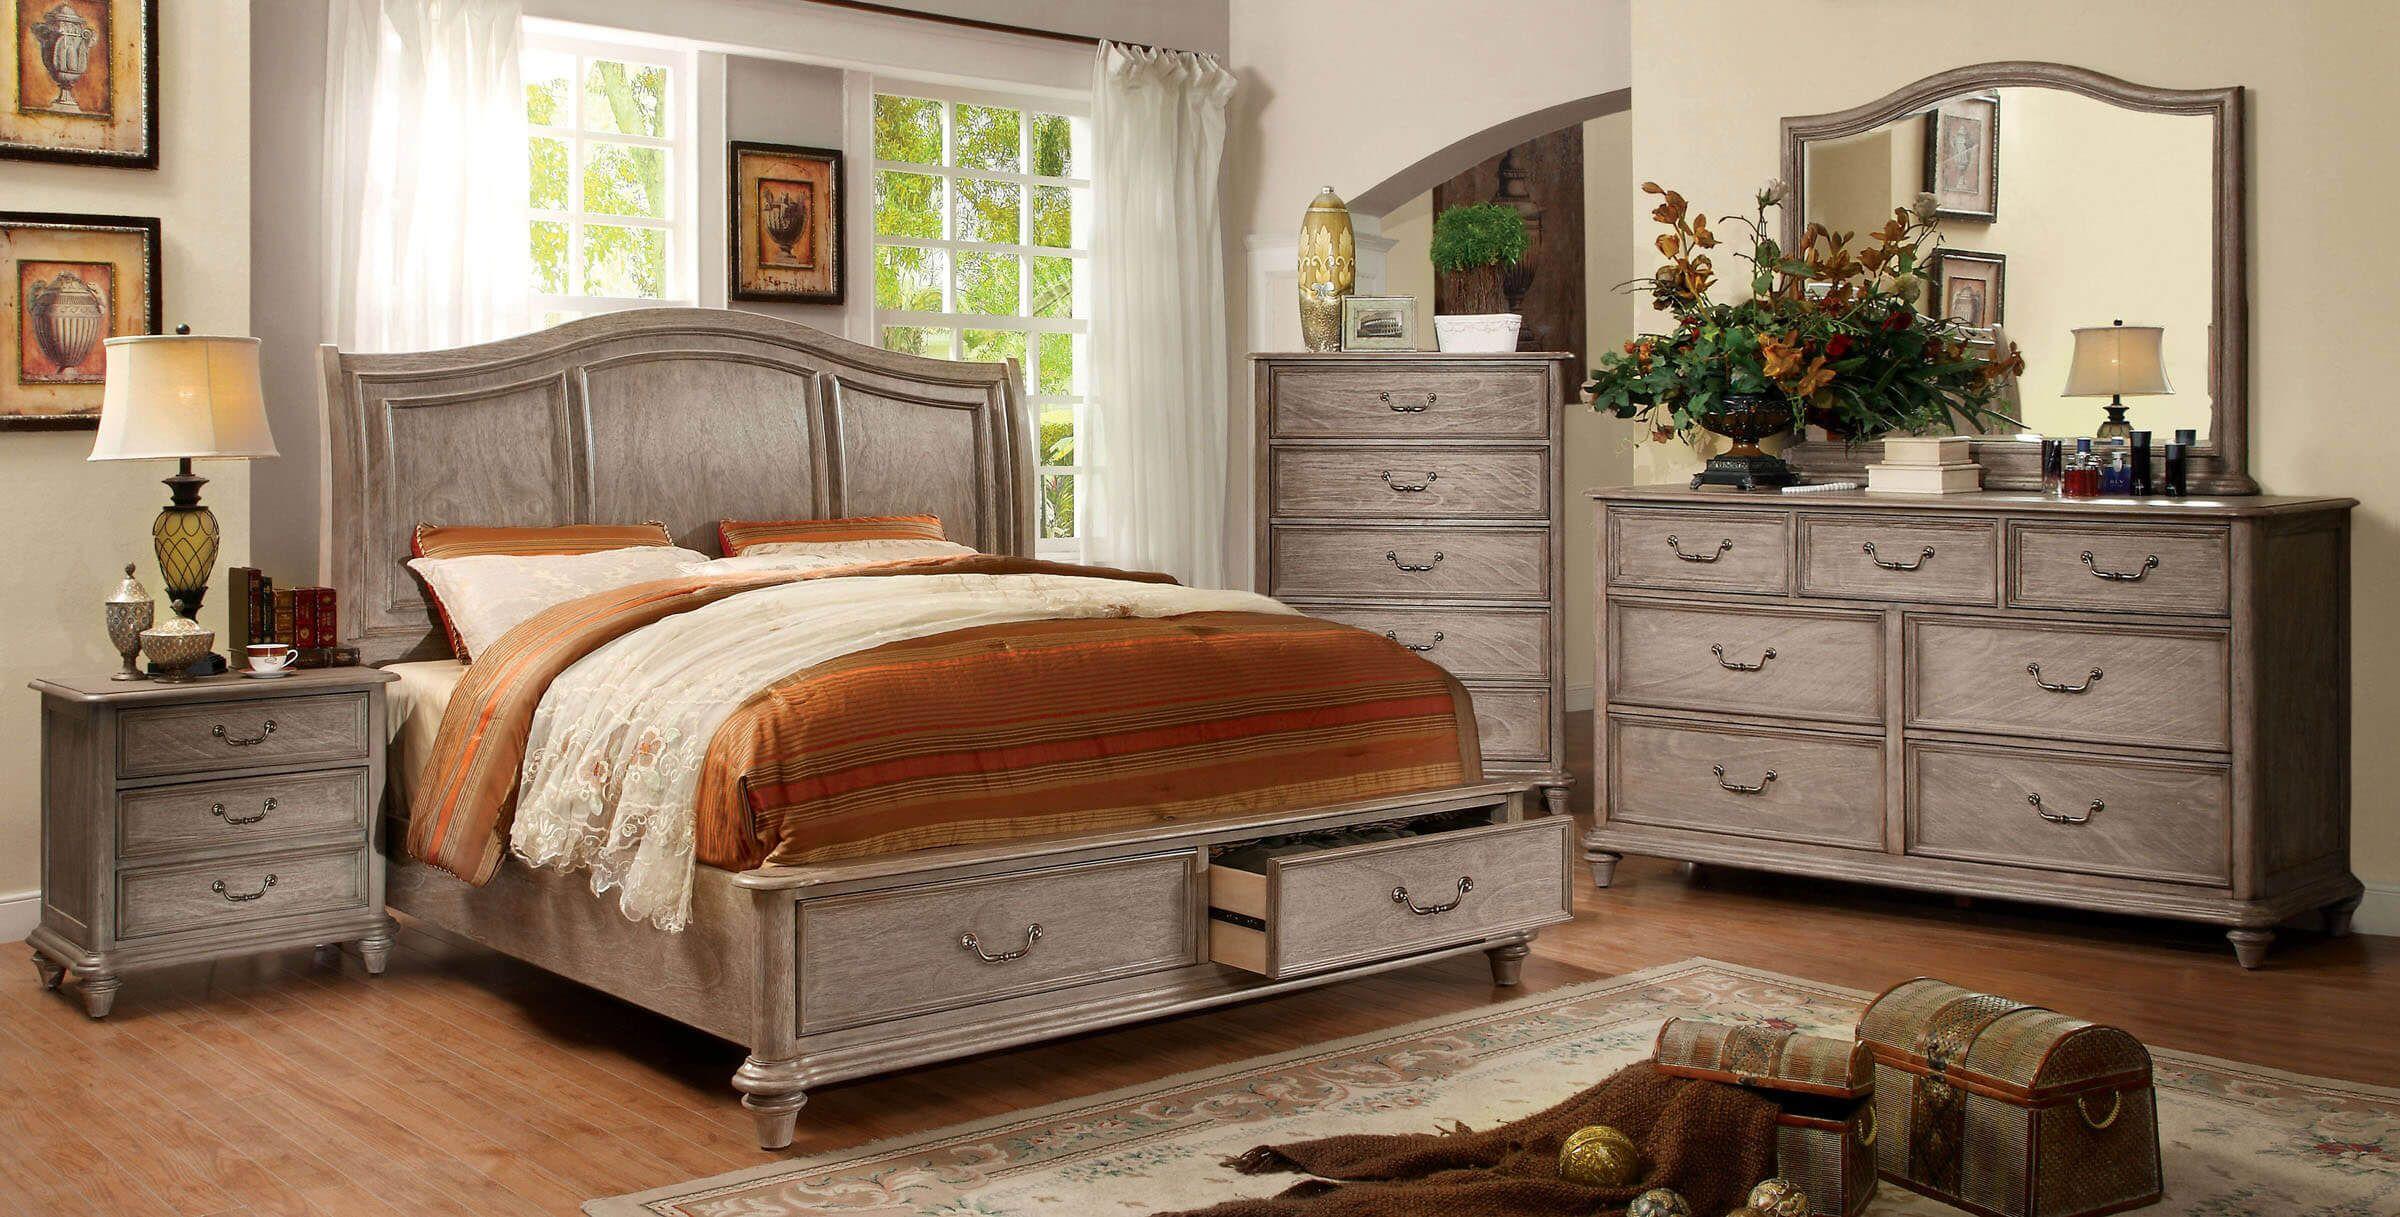 Gleaming rustic bedroom furniture sets pictures good rustic bedroom